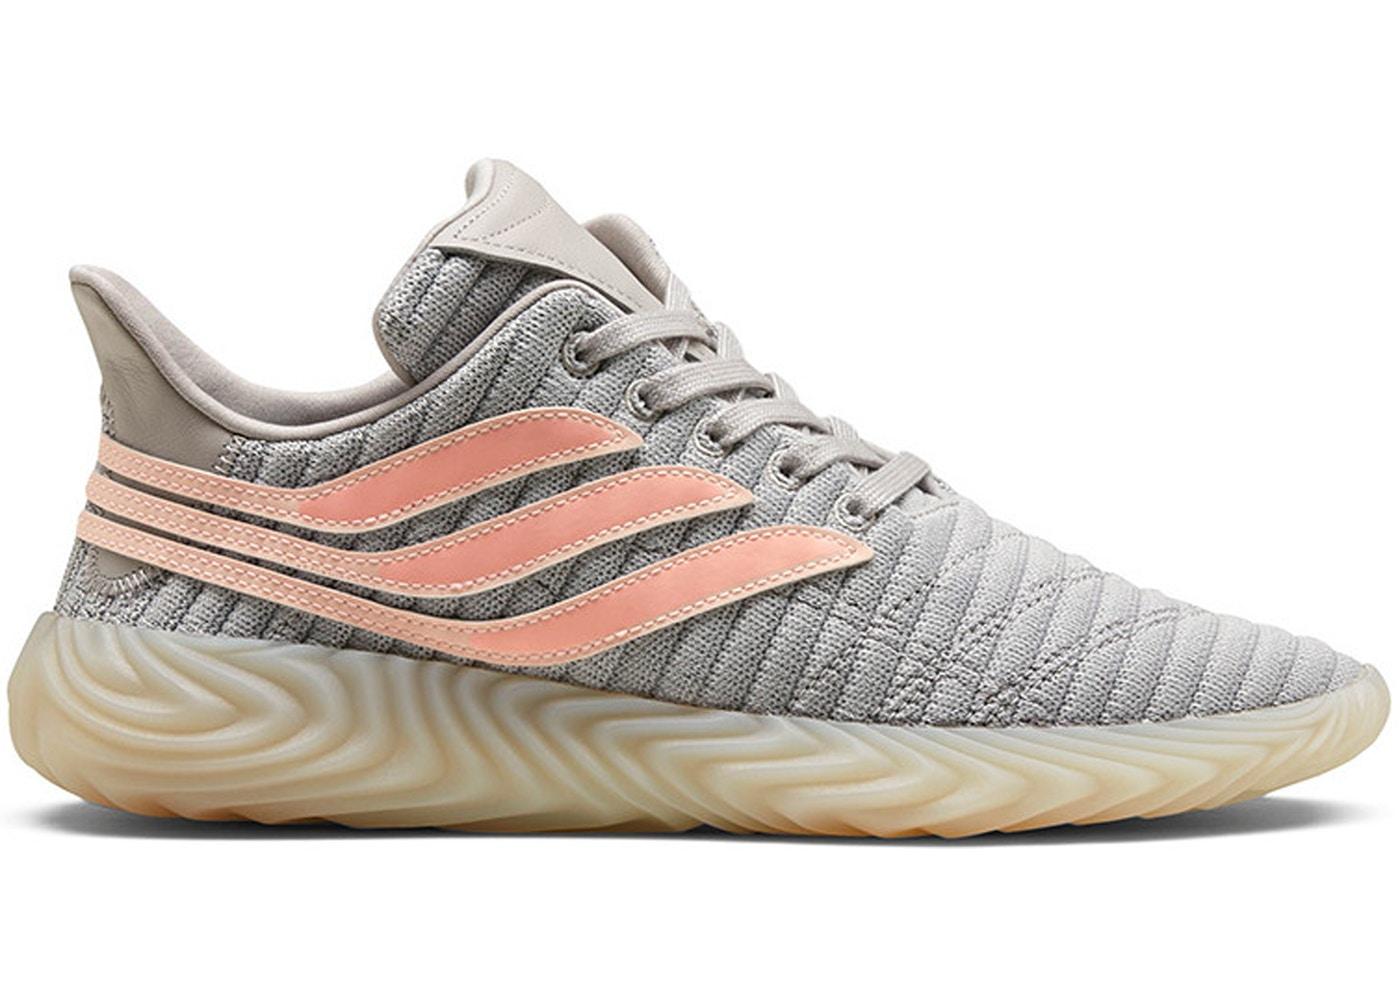 b6729373da2d7c Adidas Sobakov Grey Pink